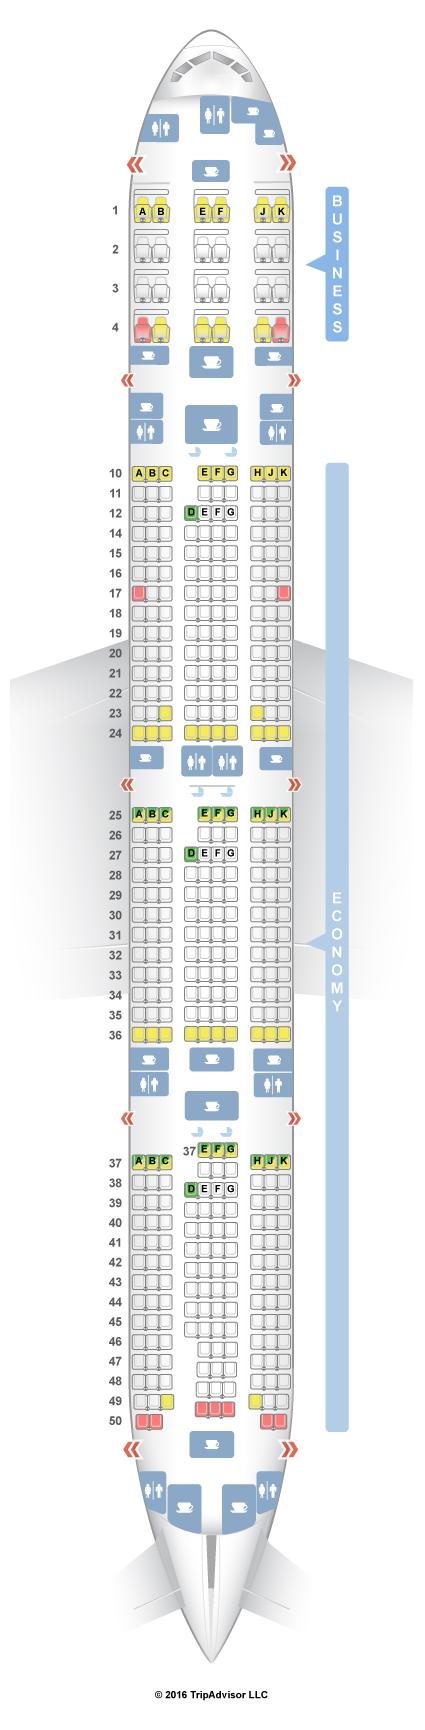 777 300er seat map cathay pacific Etihad Boeing 777 300er Seatguru لم يسبق له مثيل الصور Tier3 Xyz 777 300er seat map cathay pacific